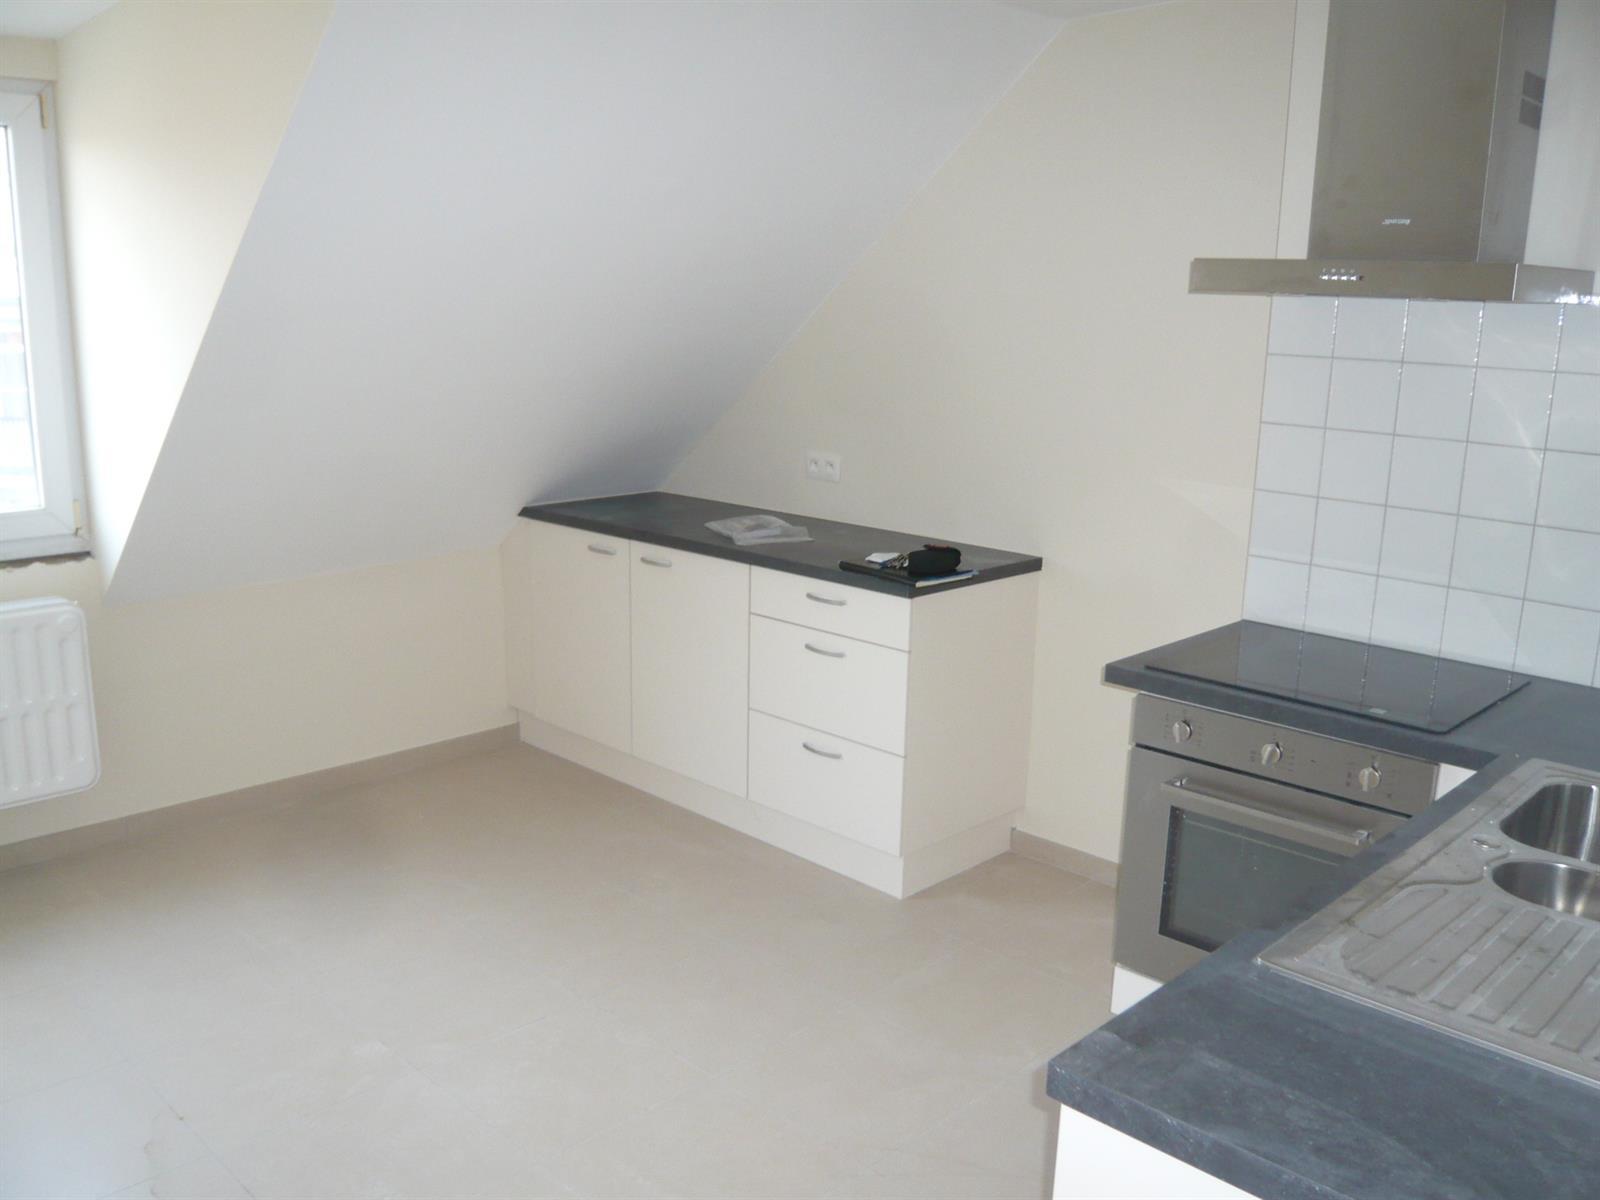 Appartement - Woluwe-Saint-Lambert - #4286376-14